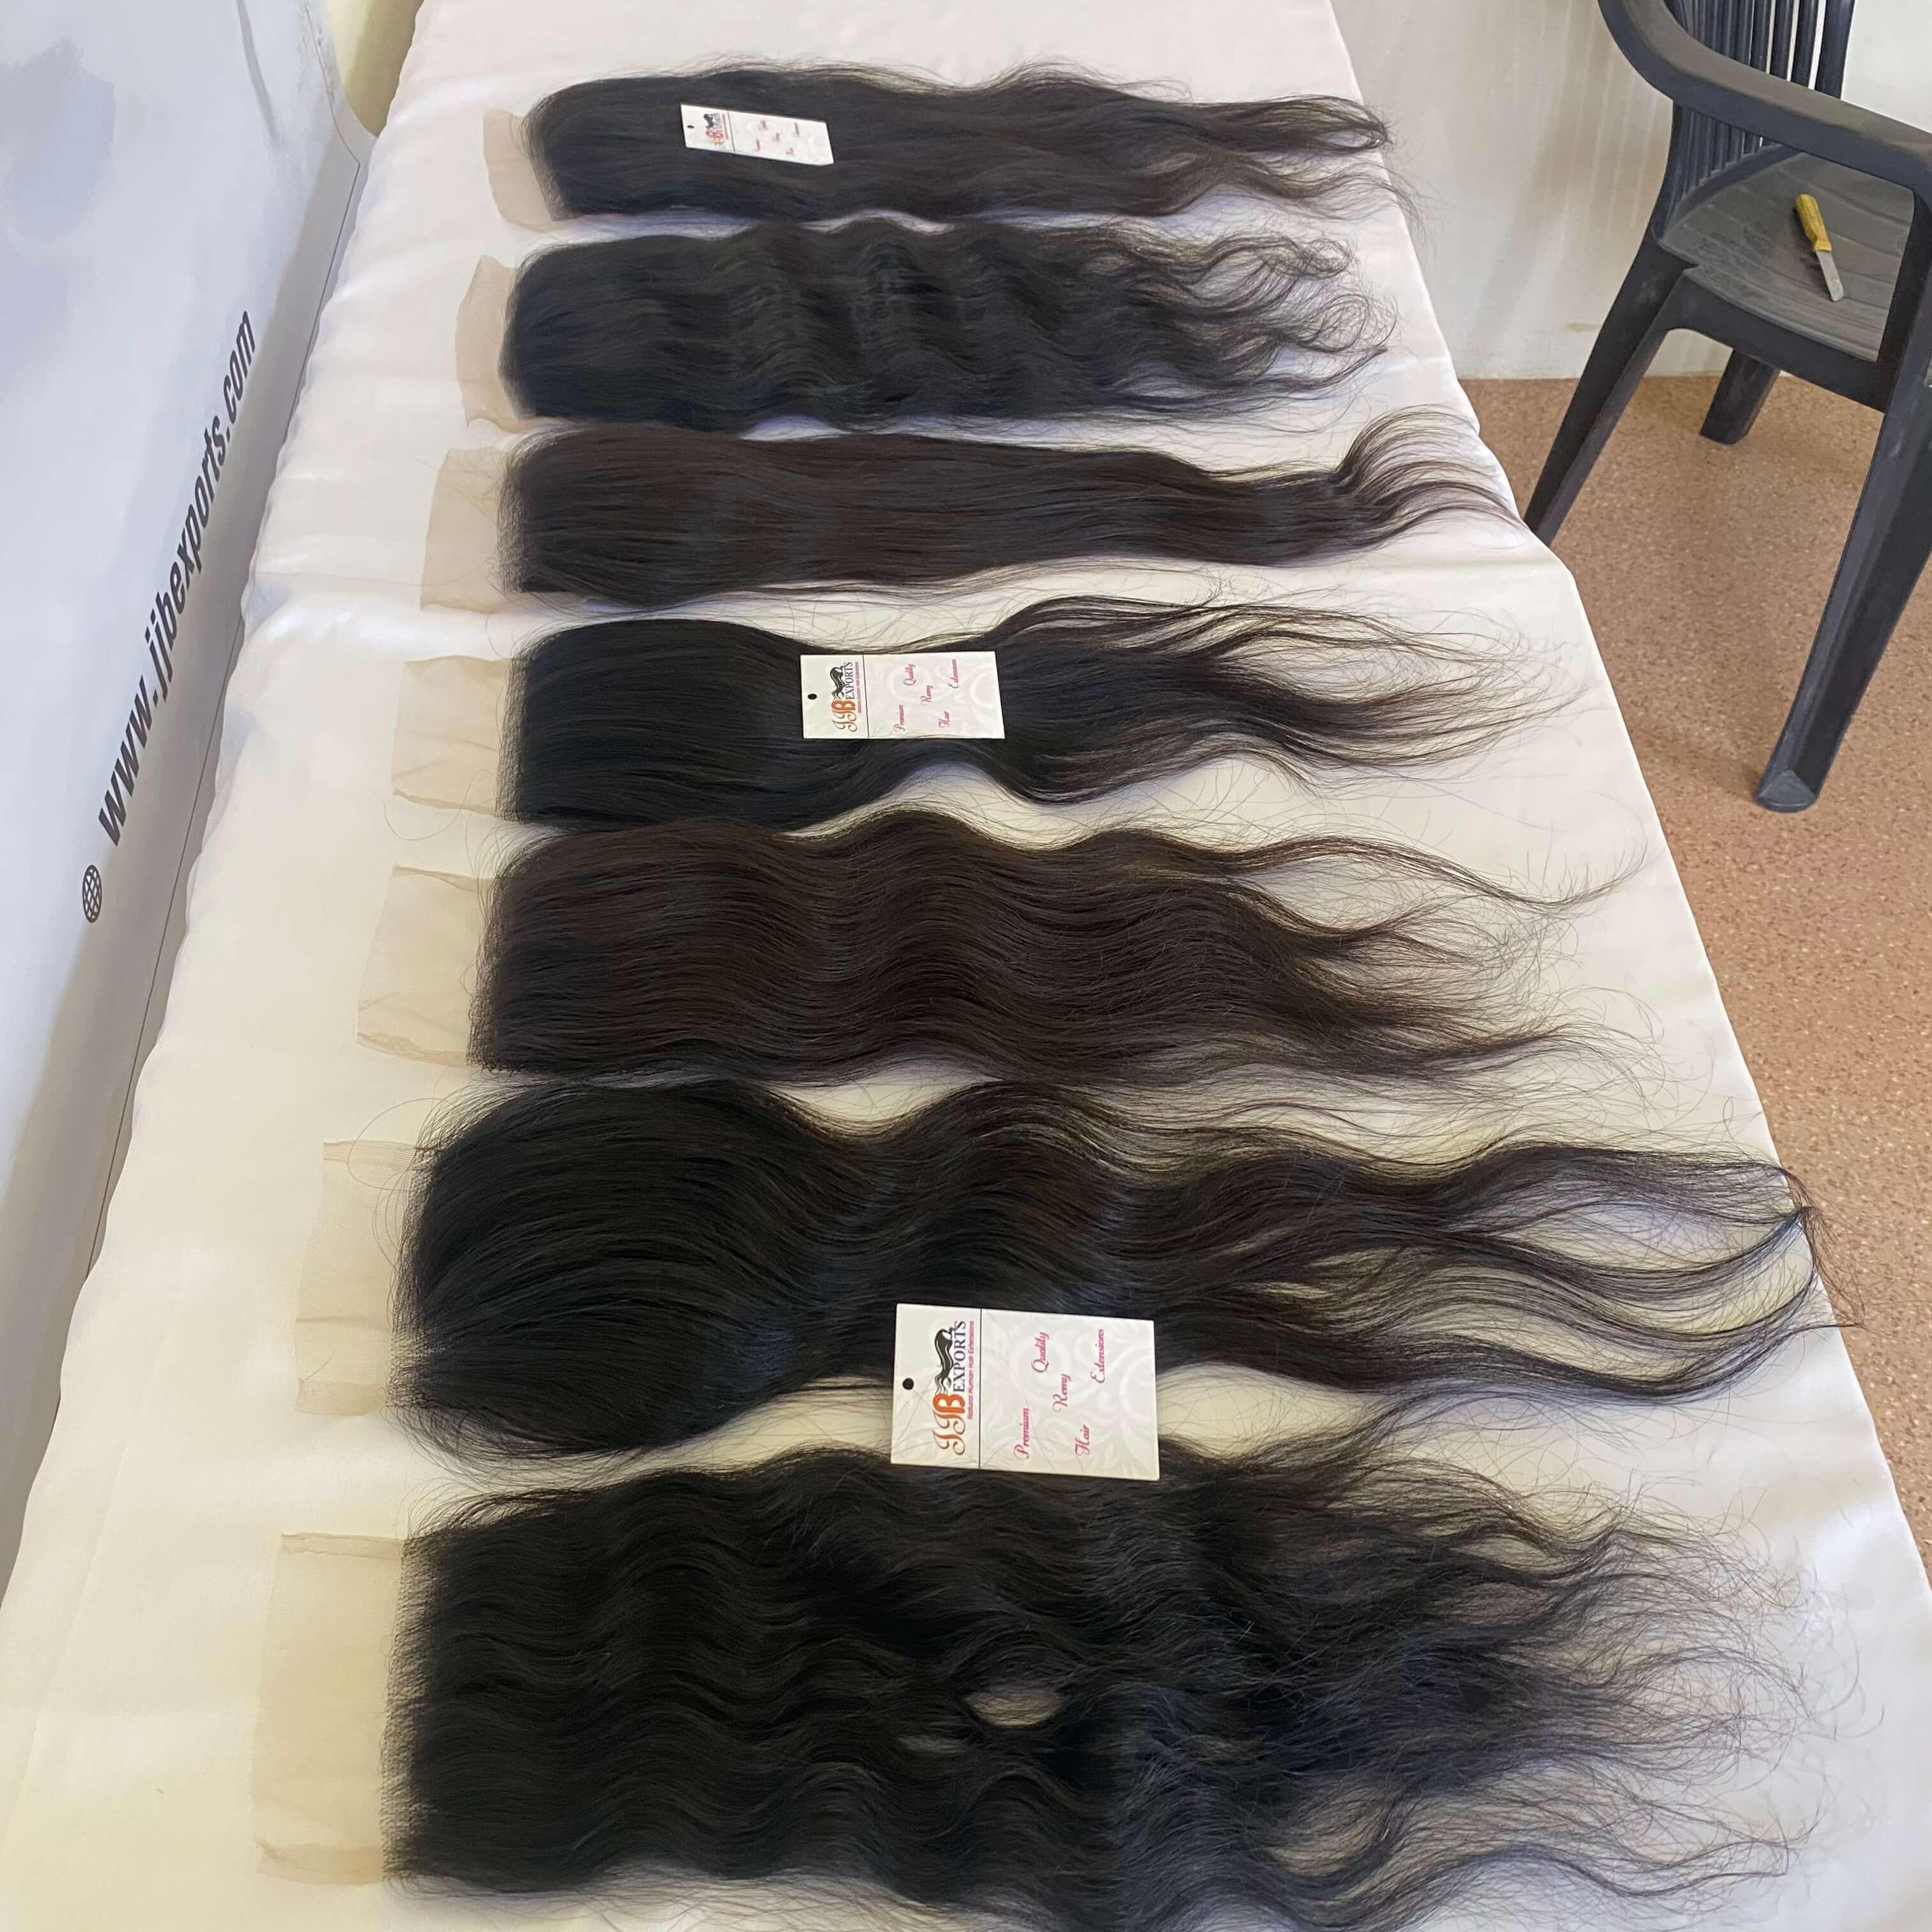 Thin Lace Clousre 4x4 5x5 6x6 Virgin Remy Brazilian Huma Hair With Weft Bundle